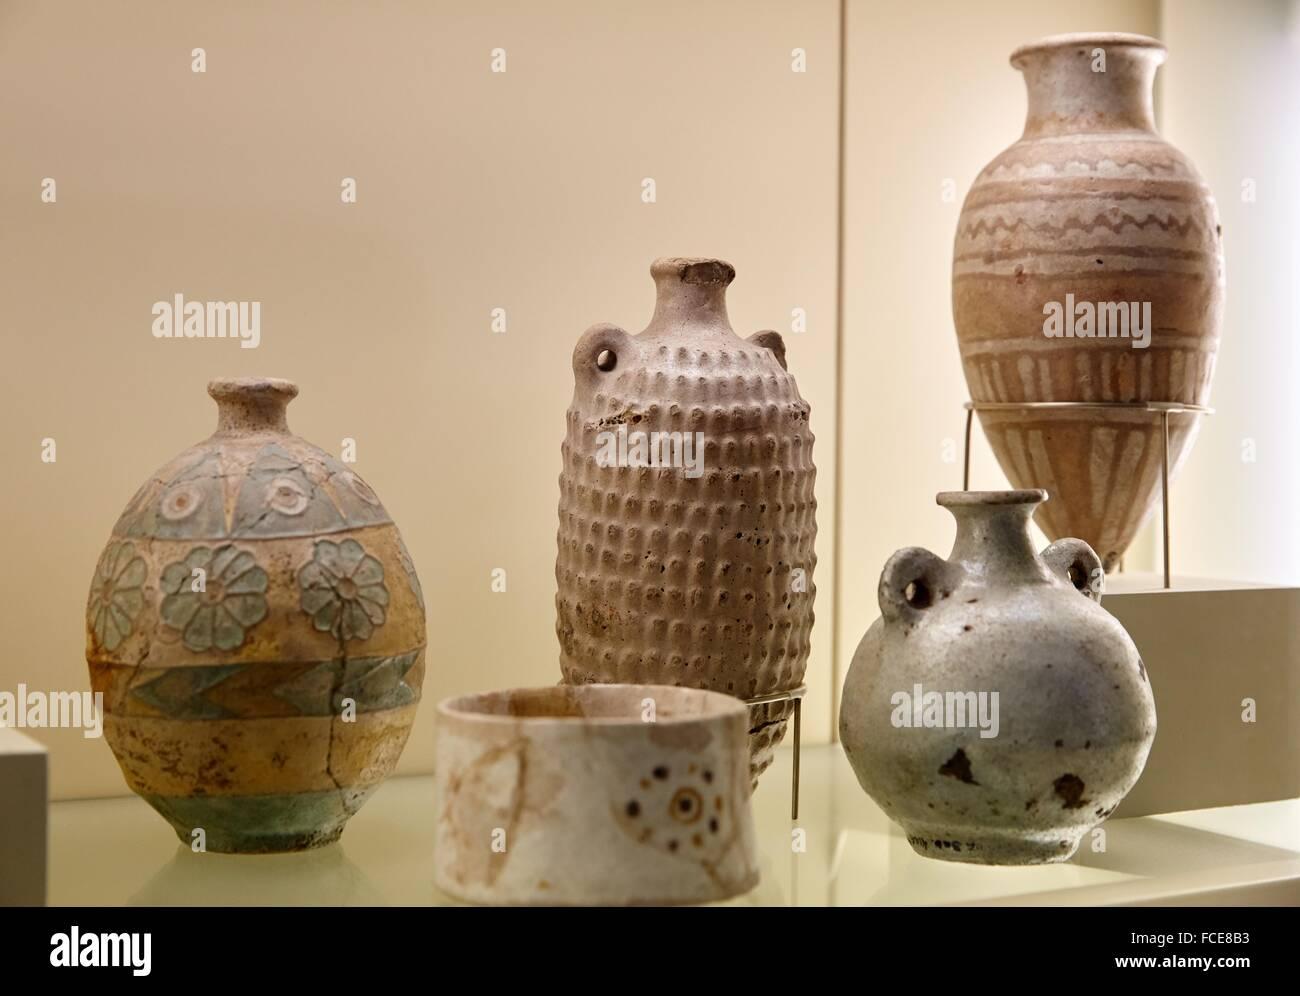 Farbig glasierte GefŠ§ gebrannter Ton, Babylon, Pergamon Museum, Berlin, Germany. - Stock Image